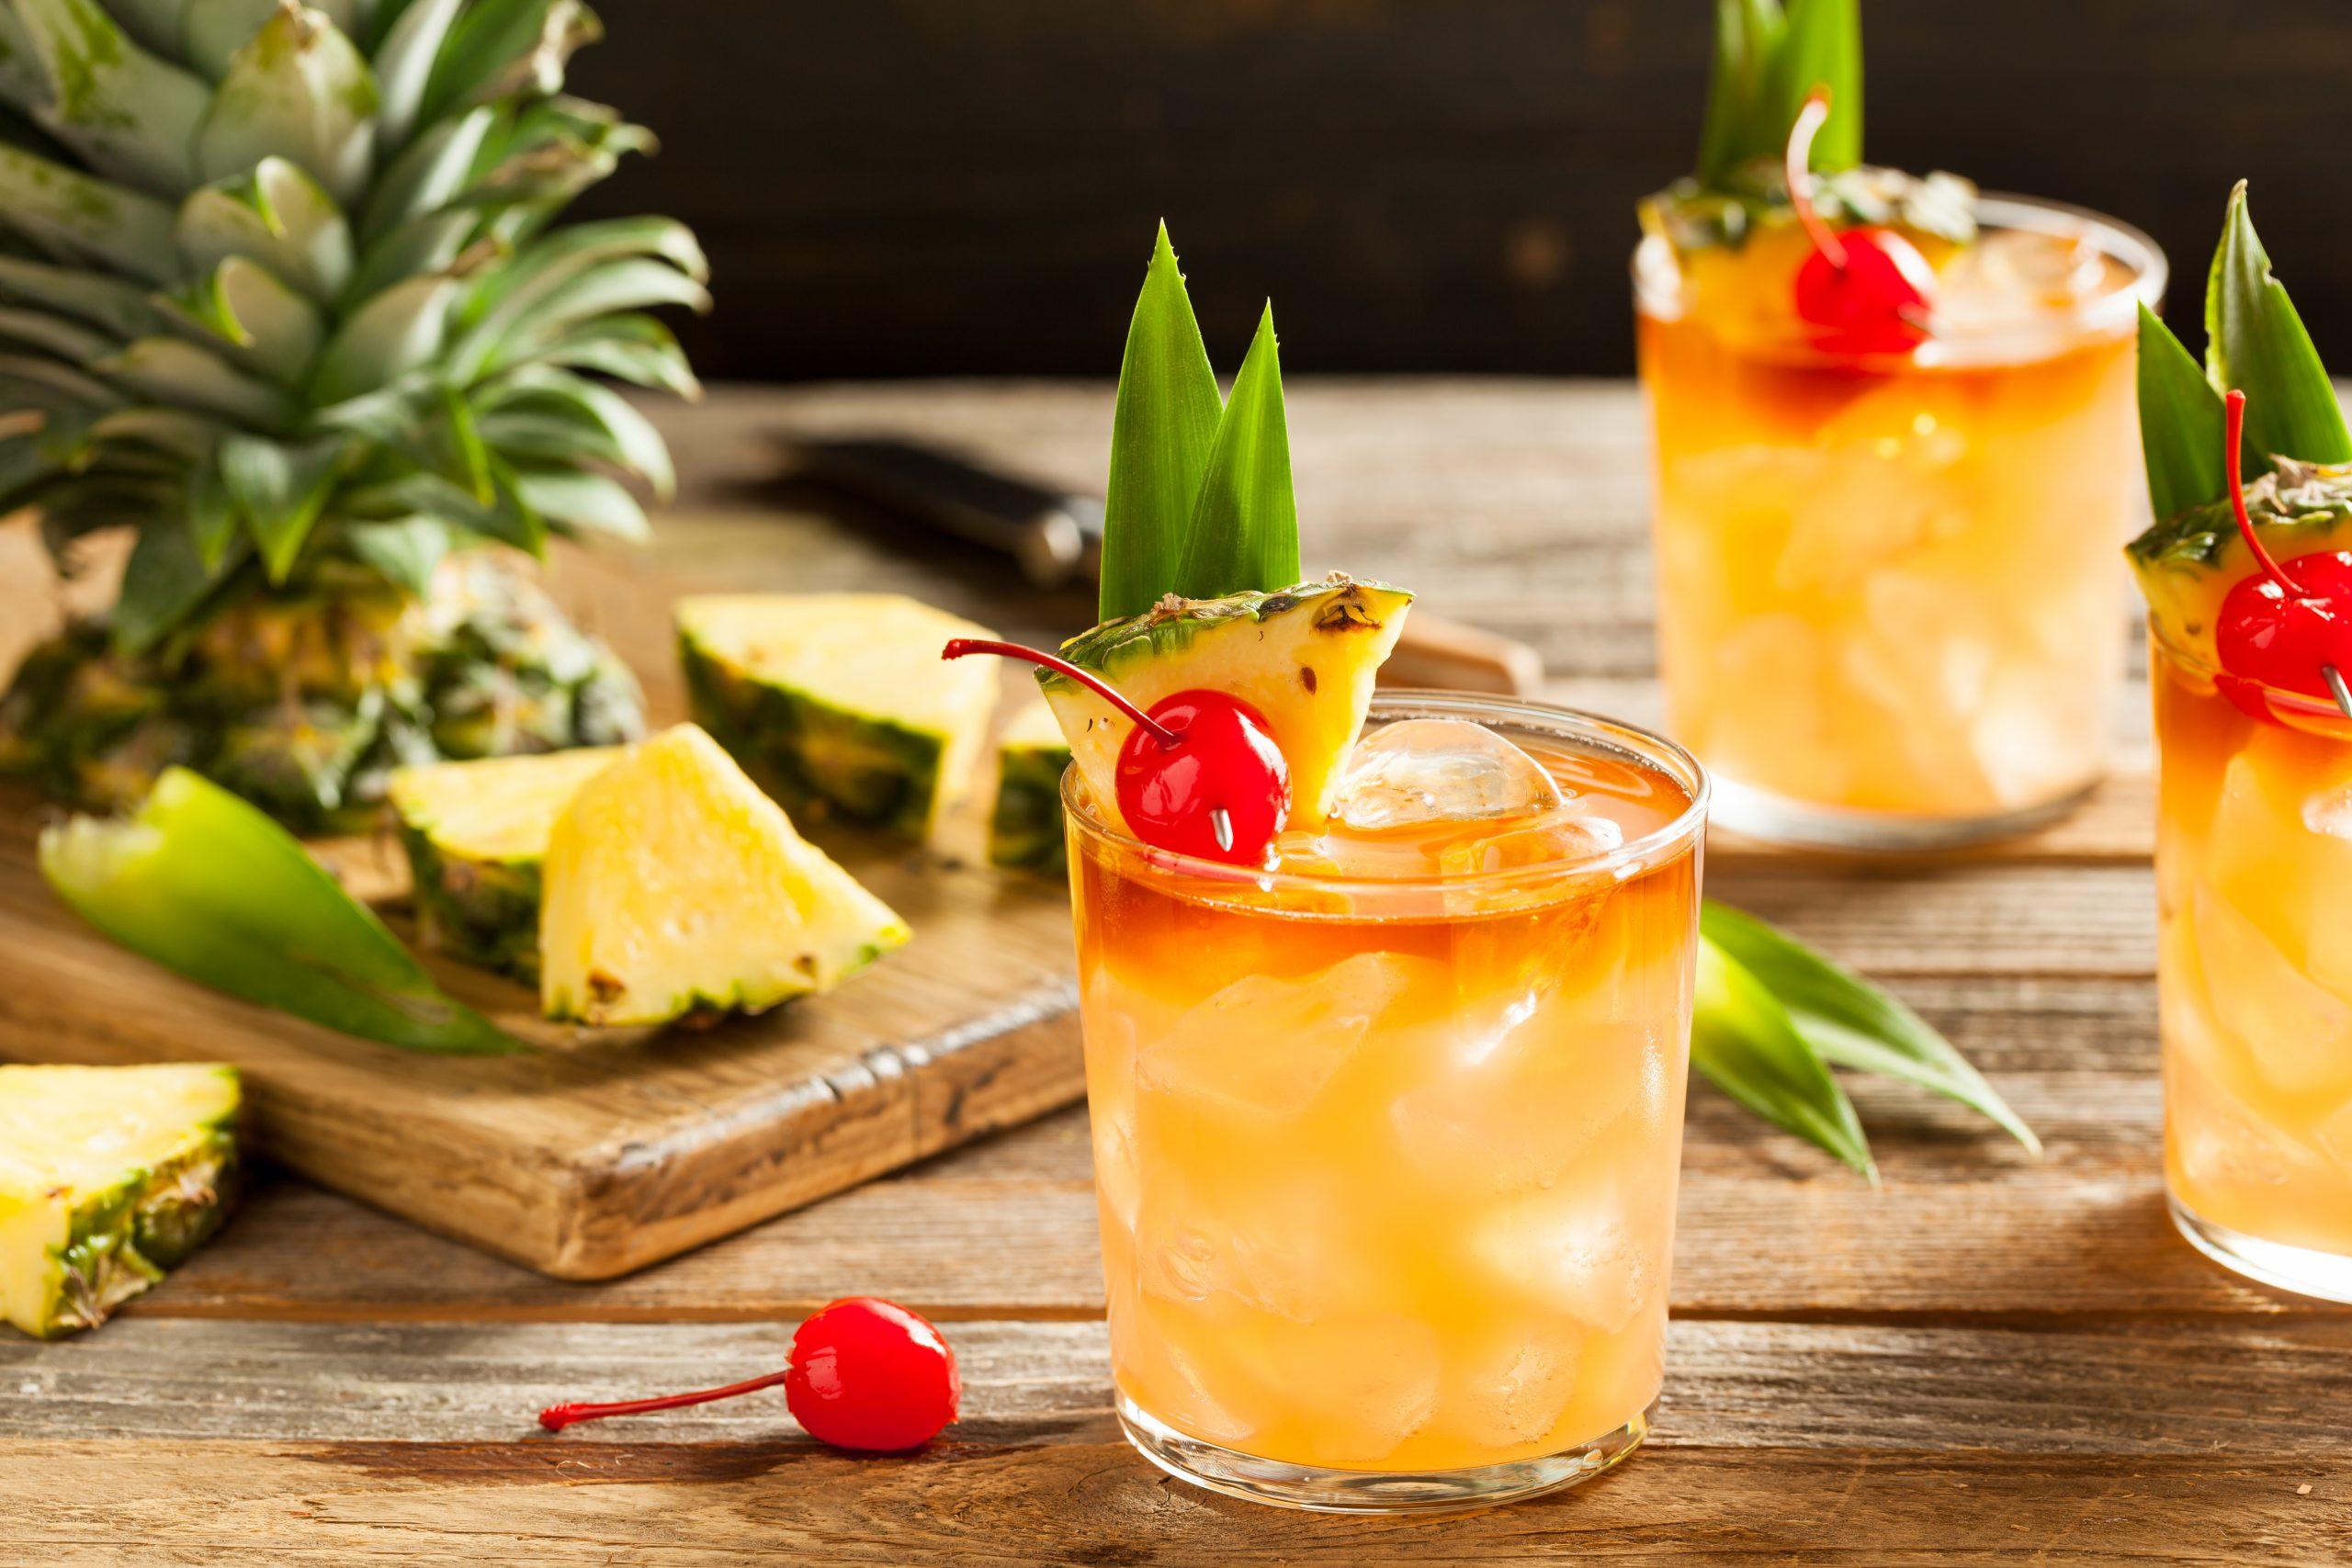 Homemade Mai Tai Summer Cocktail